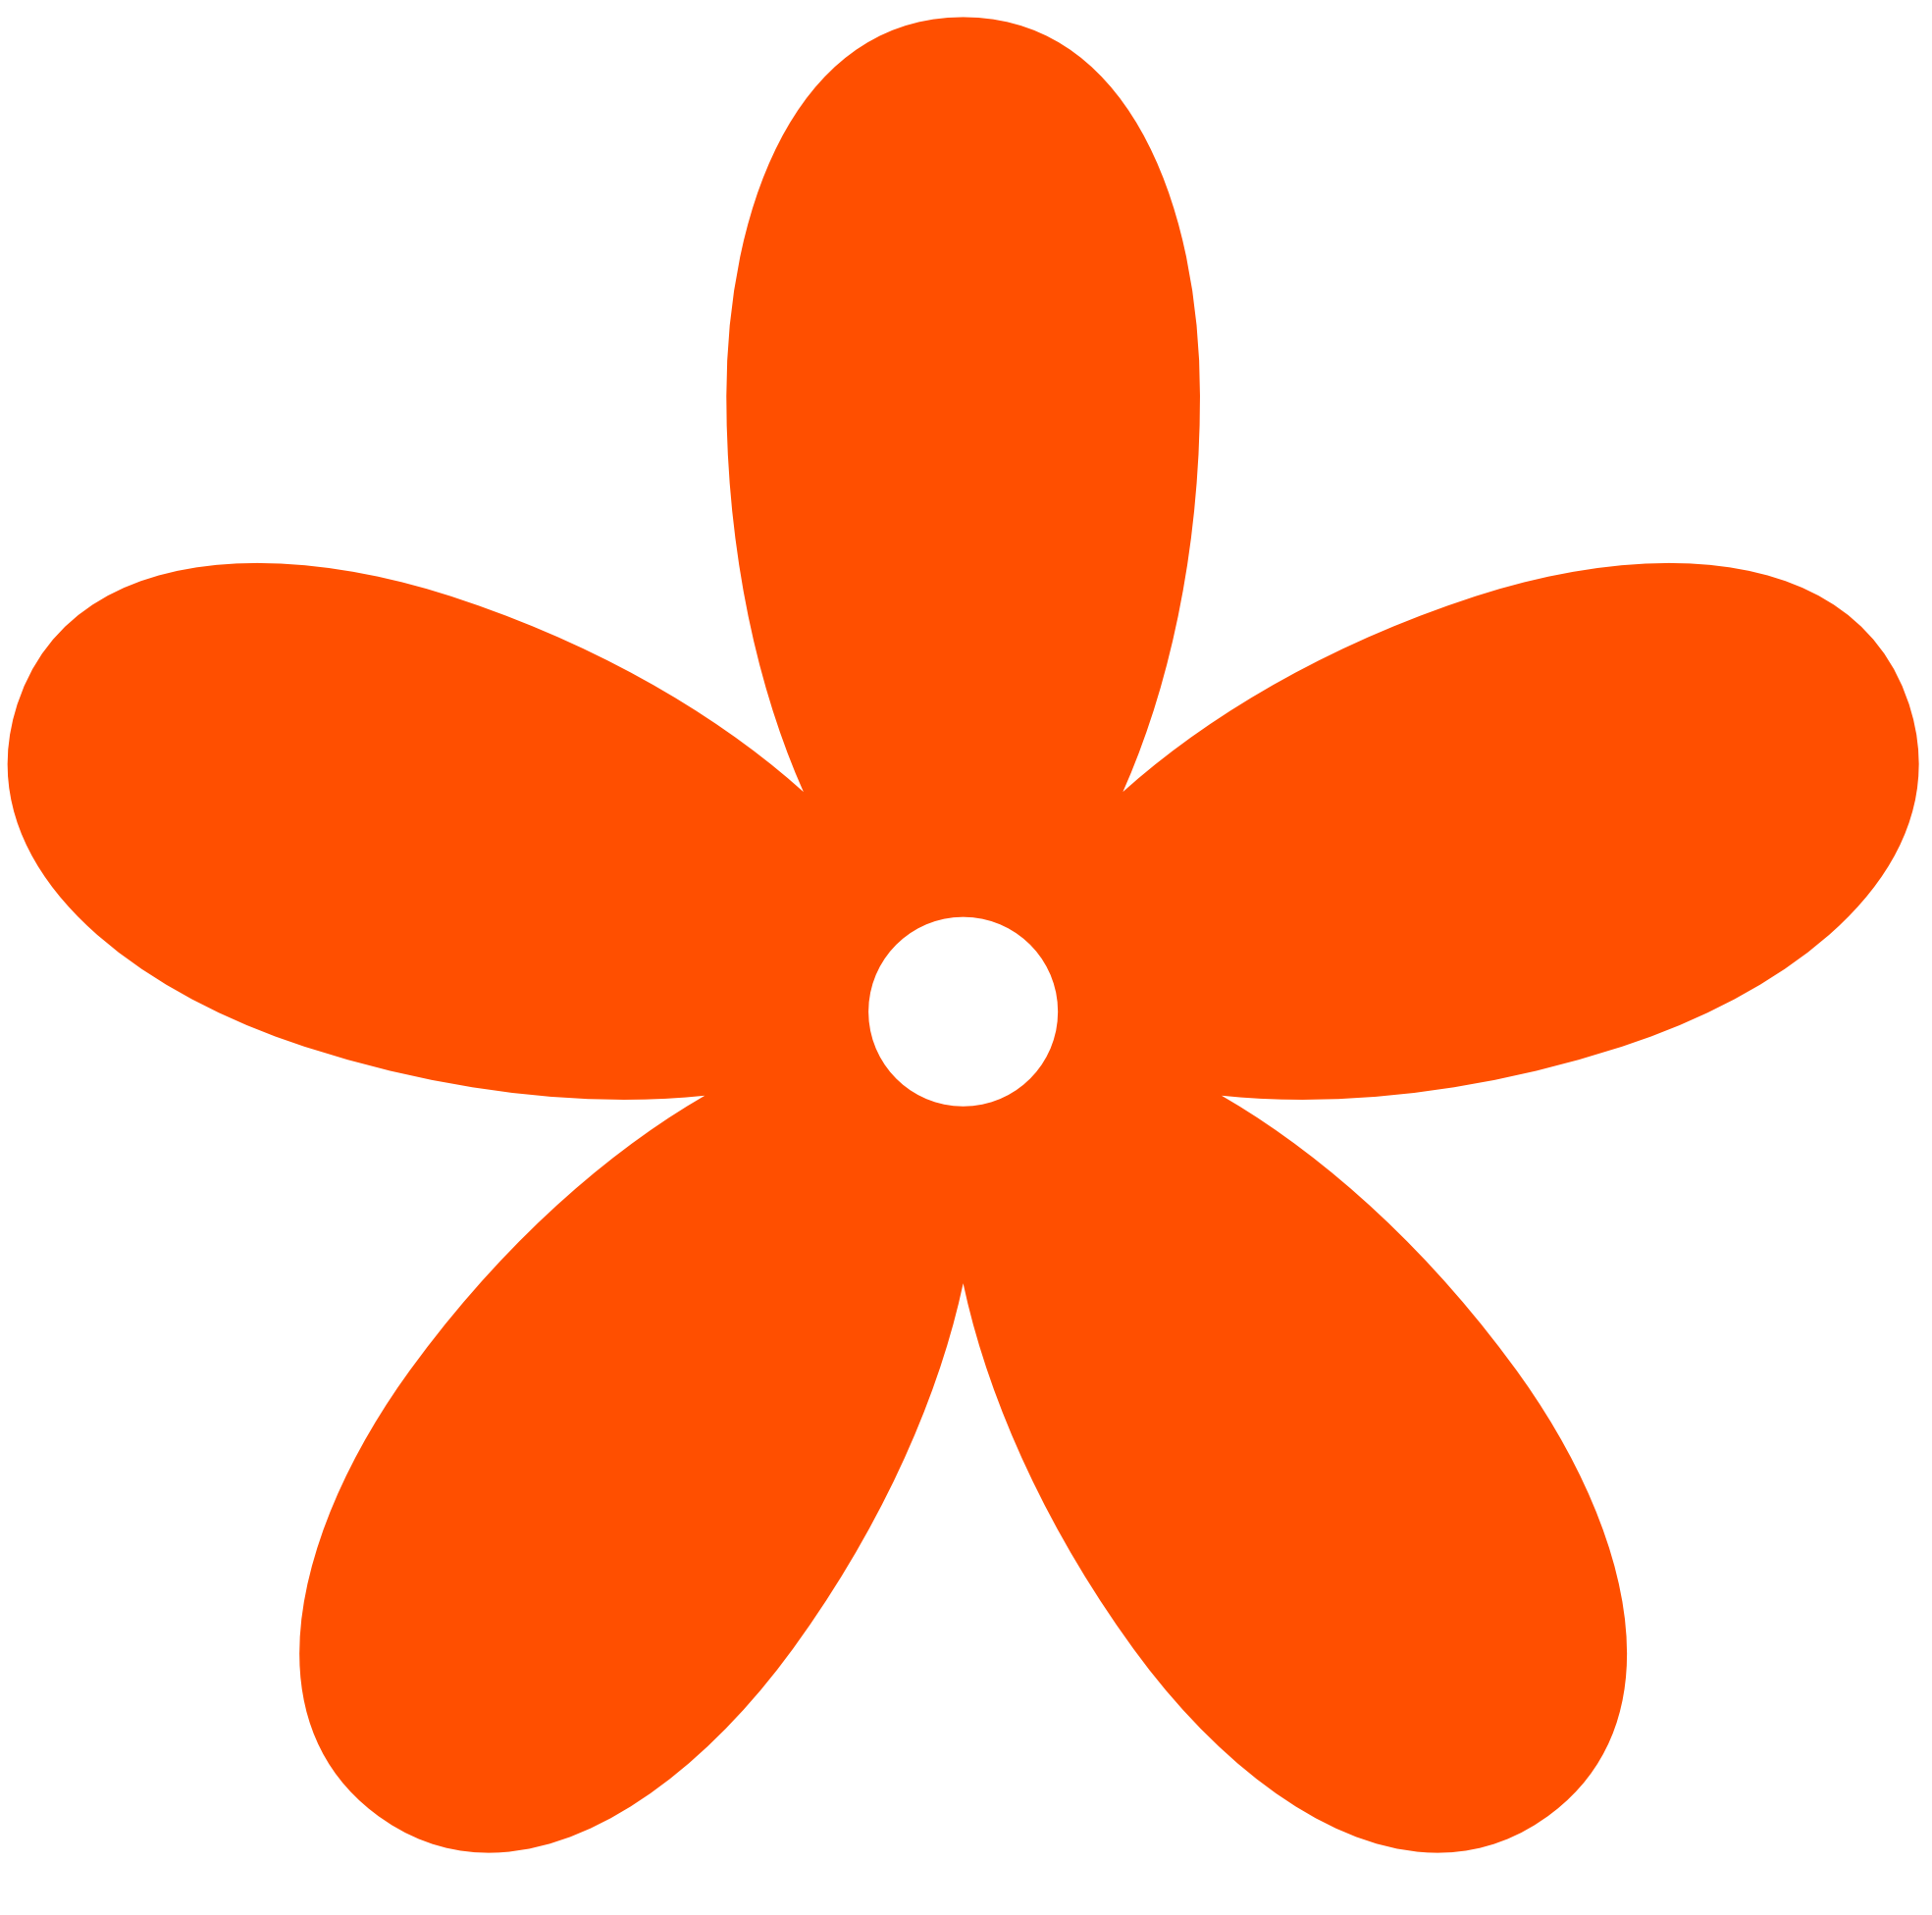 Coloring clipart orange. Color panda free images